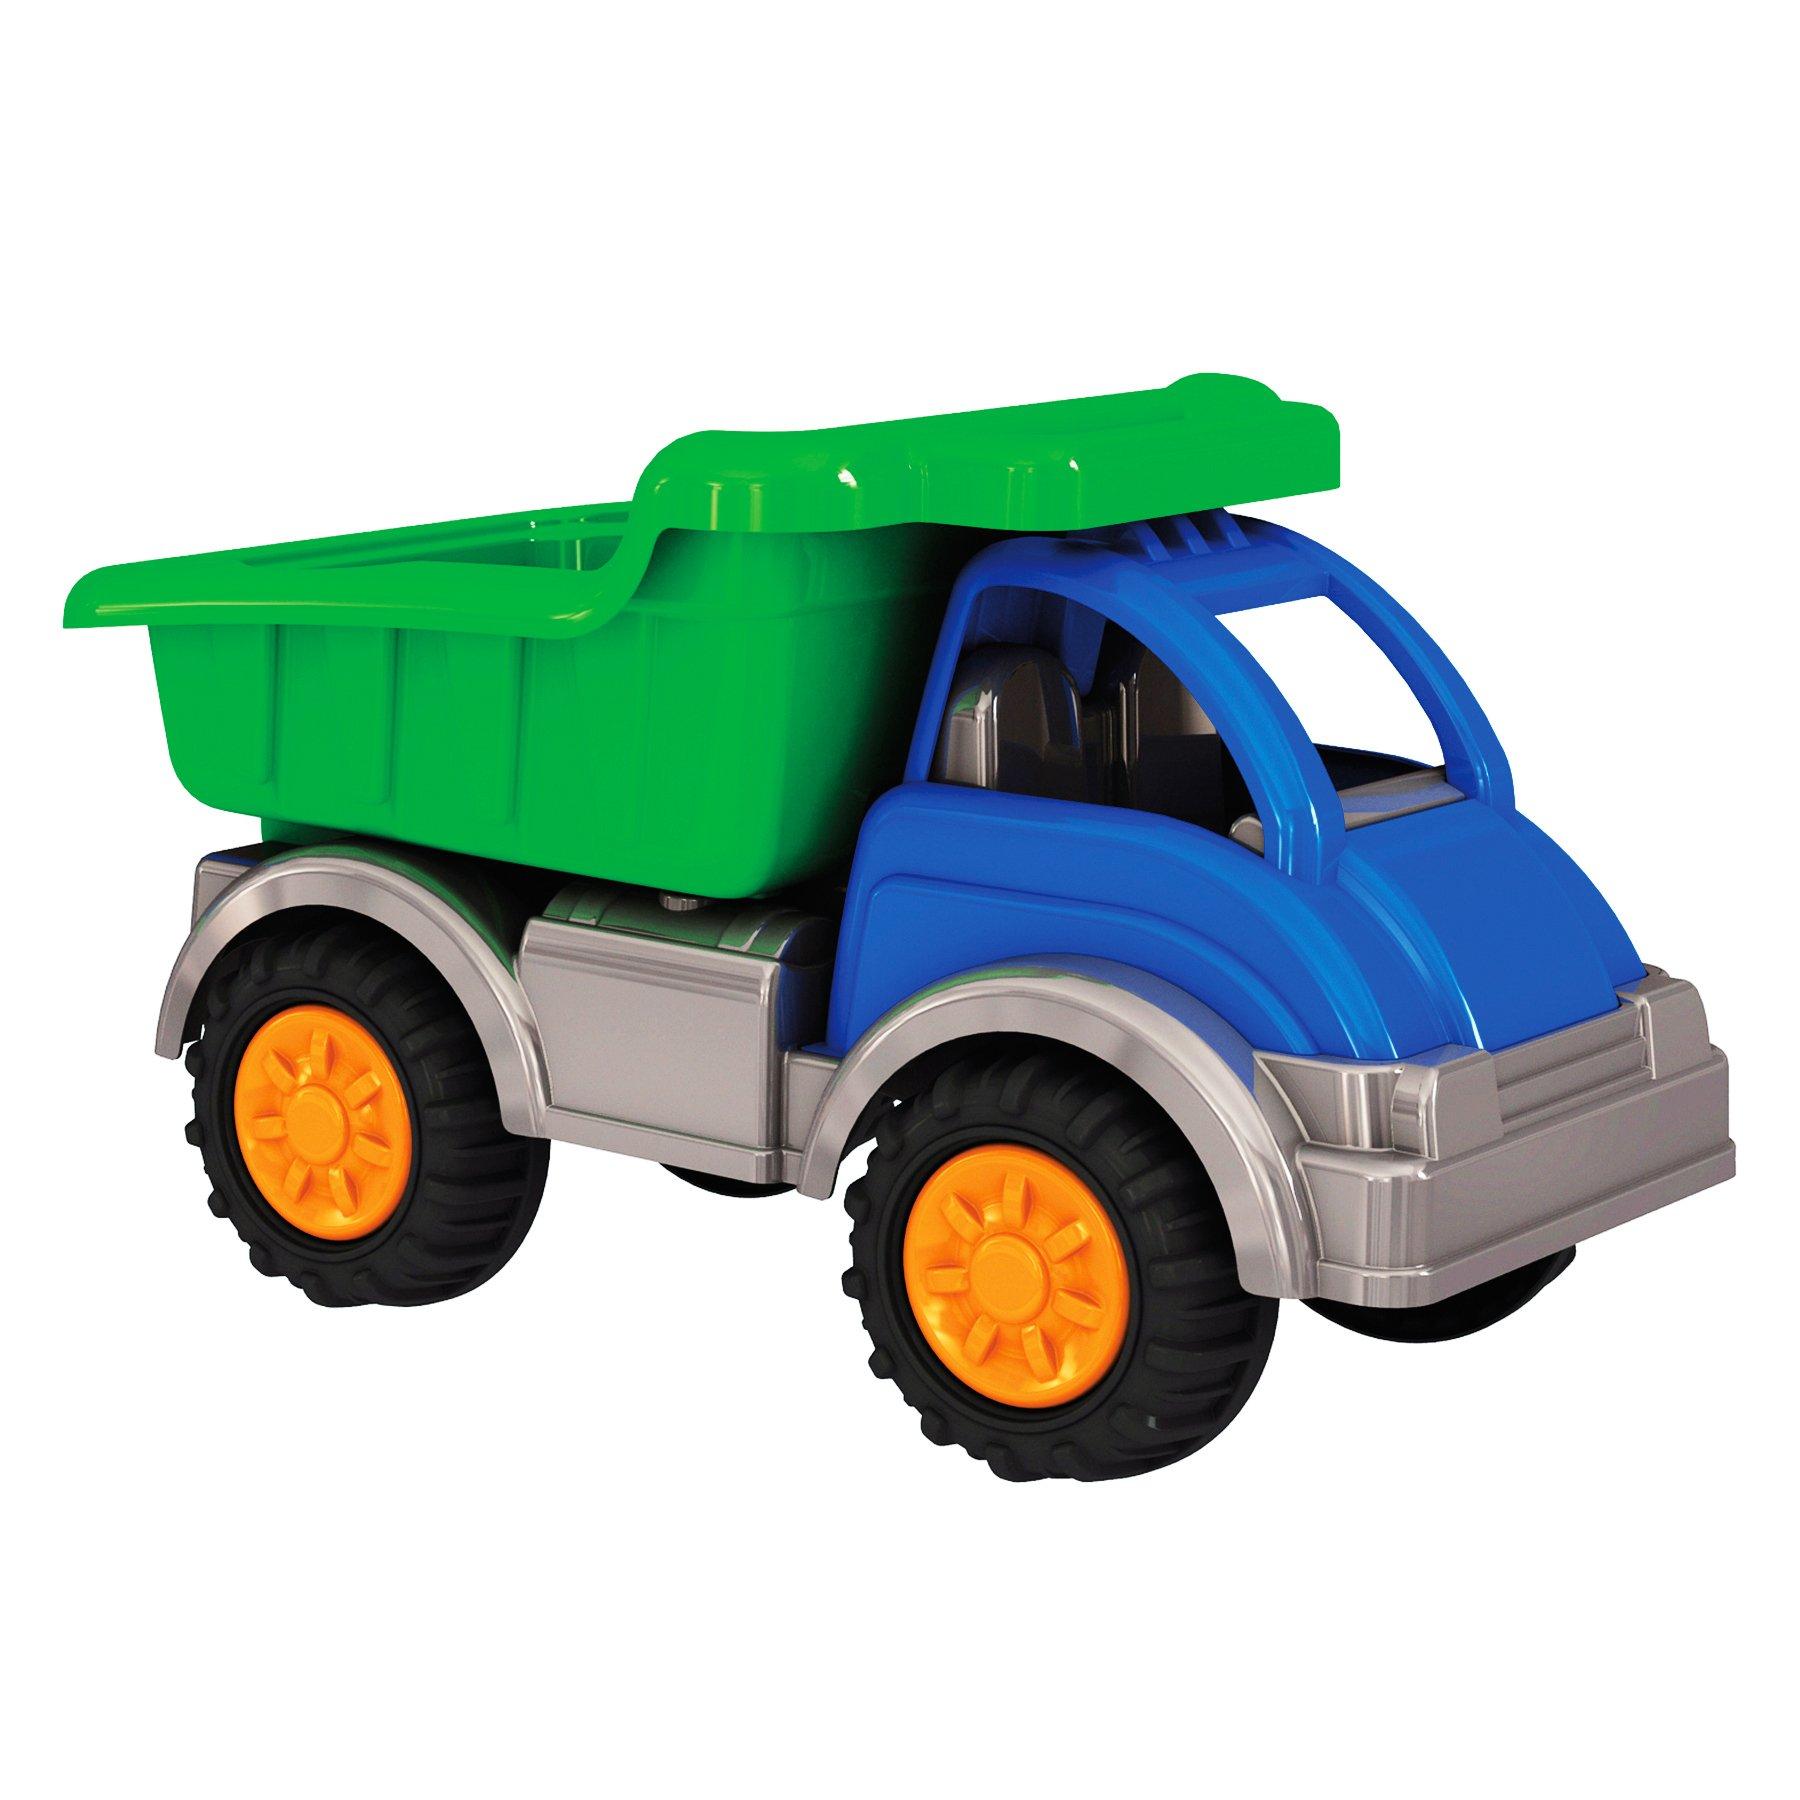 Big Dump Trucks >> Gigantic Big Dump Truck Vehicle Large Children Toddler Toy 24 New